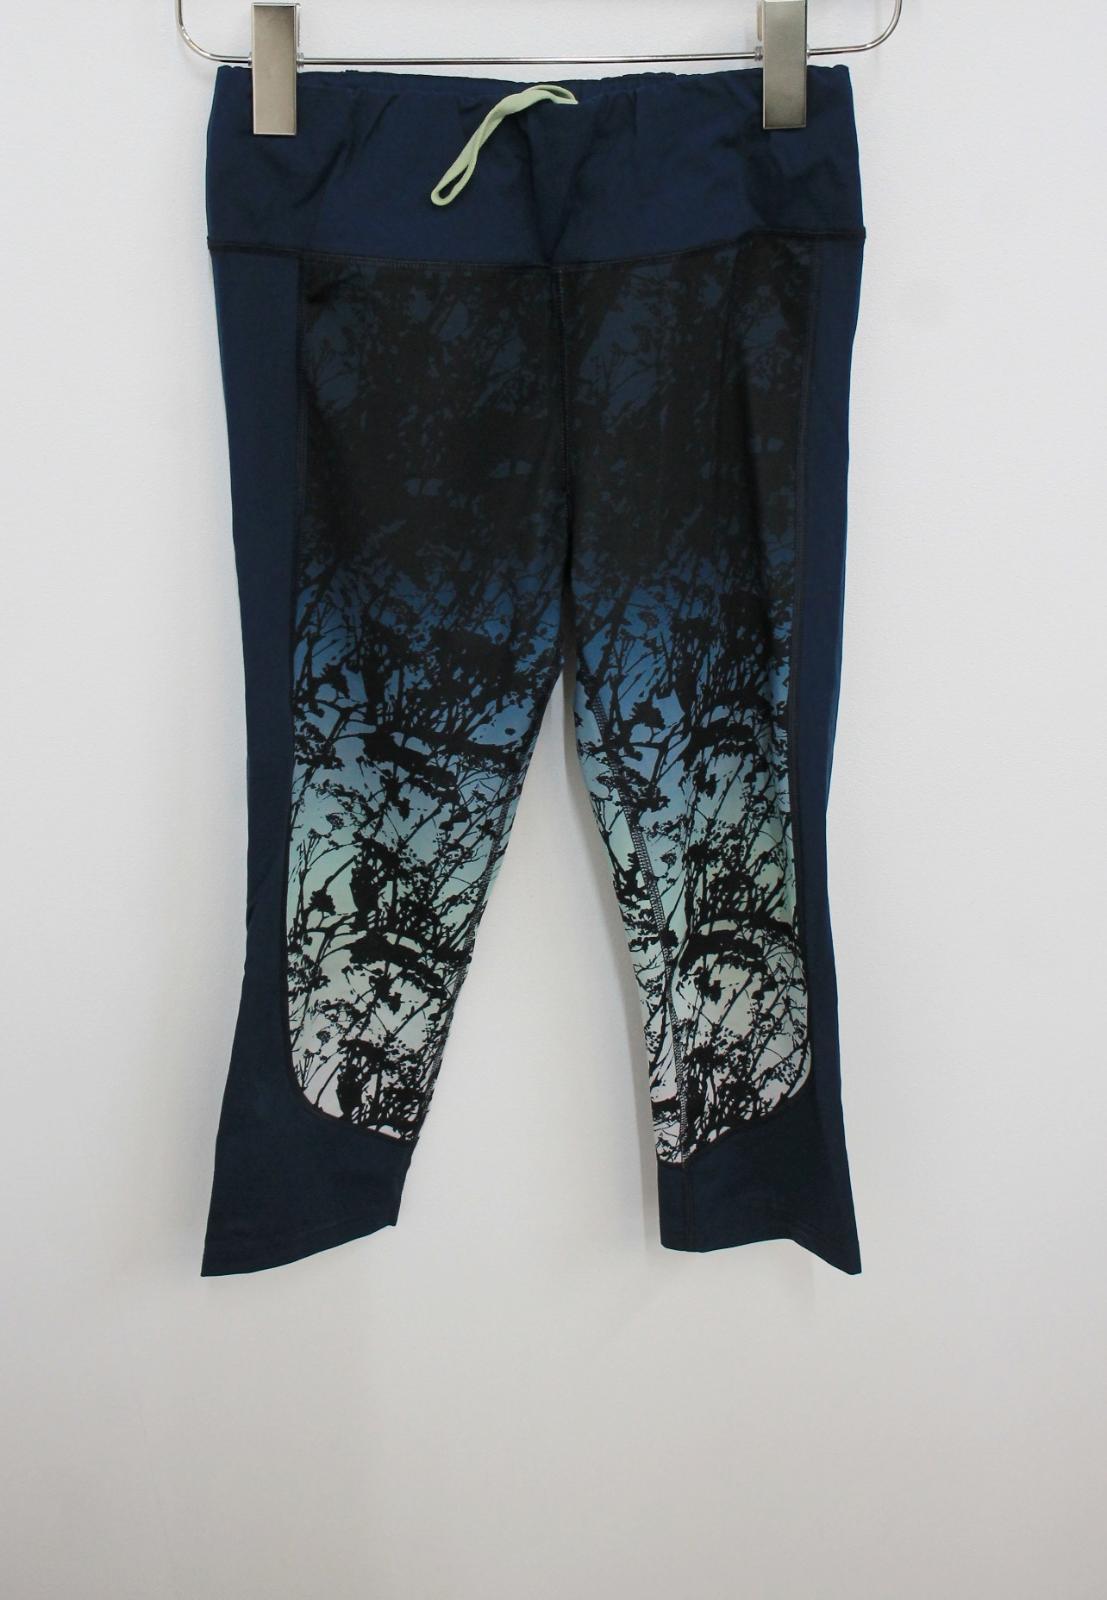 Sweaty-Betty-Damas-Azul-Oscuro-Impreso-Negro-Recortada-Leggings-Talla-S-W26-L18 miniatura 11